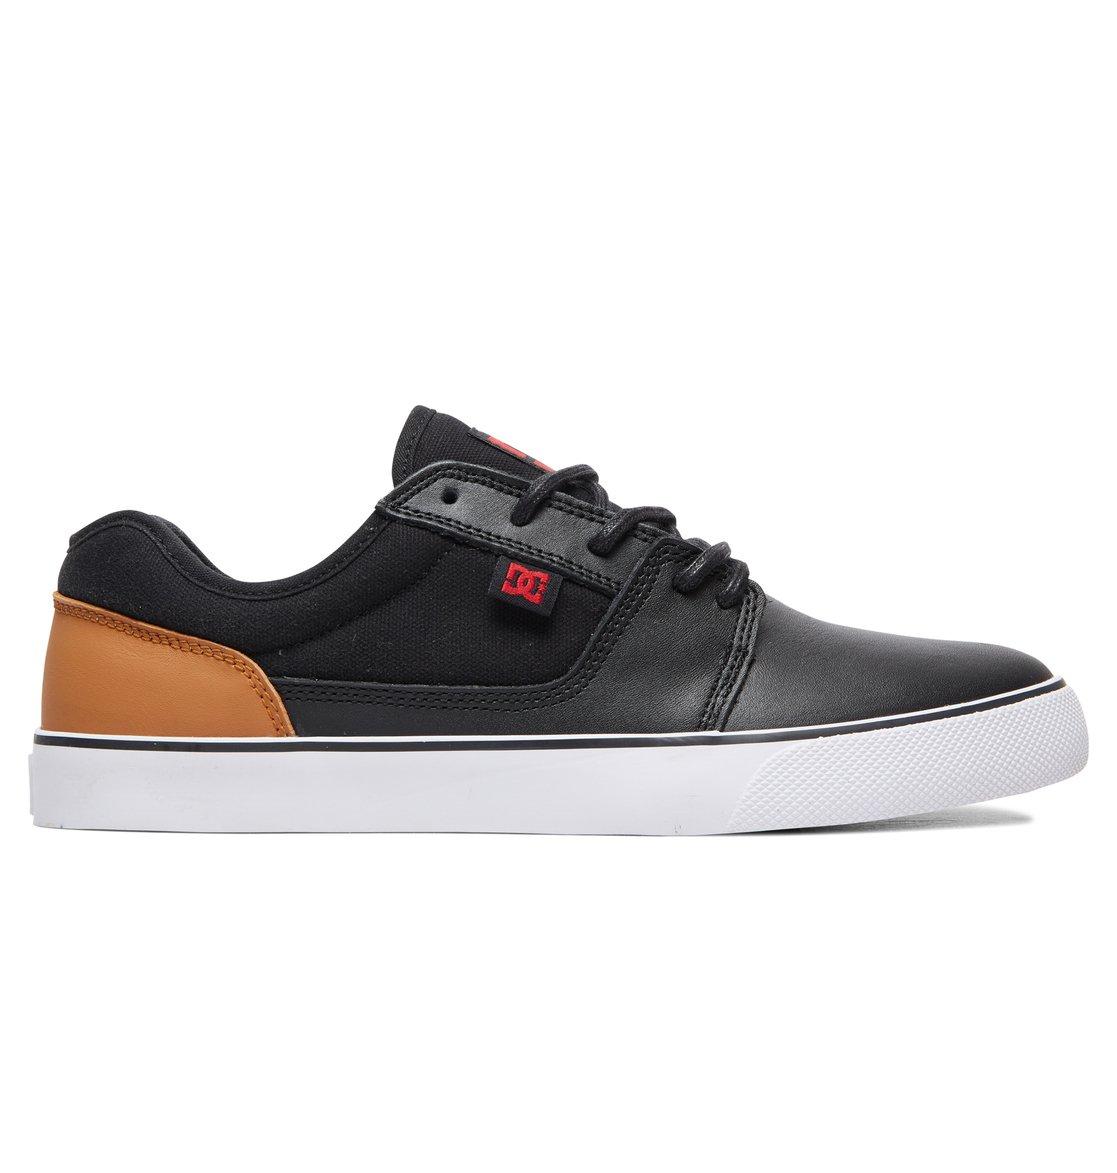 5875ec303 0 Tonik SE - Zapatos para Hombre Negro 303064 DC Shoes